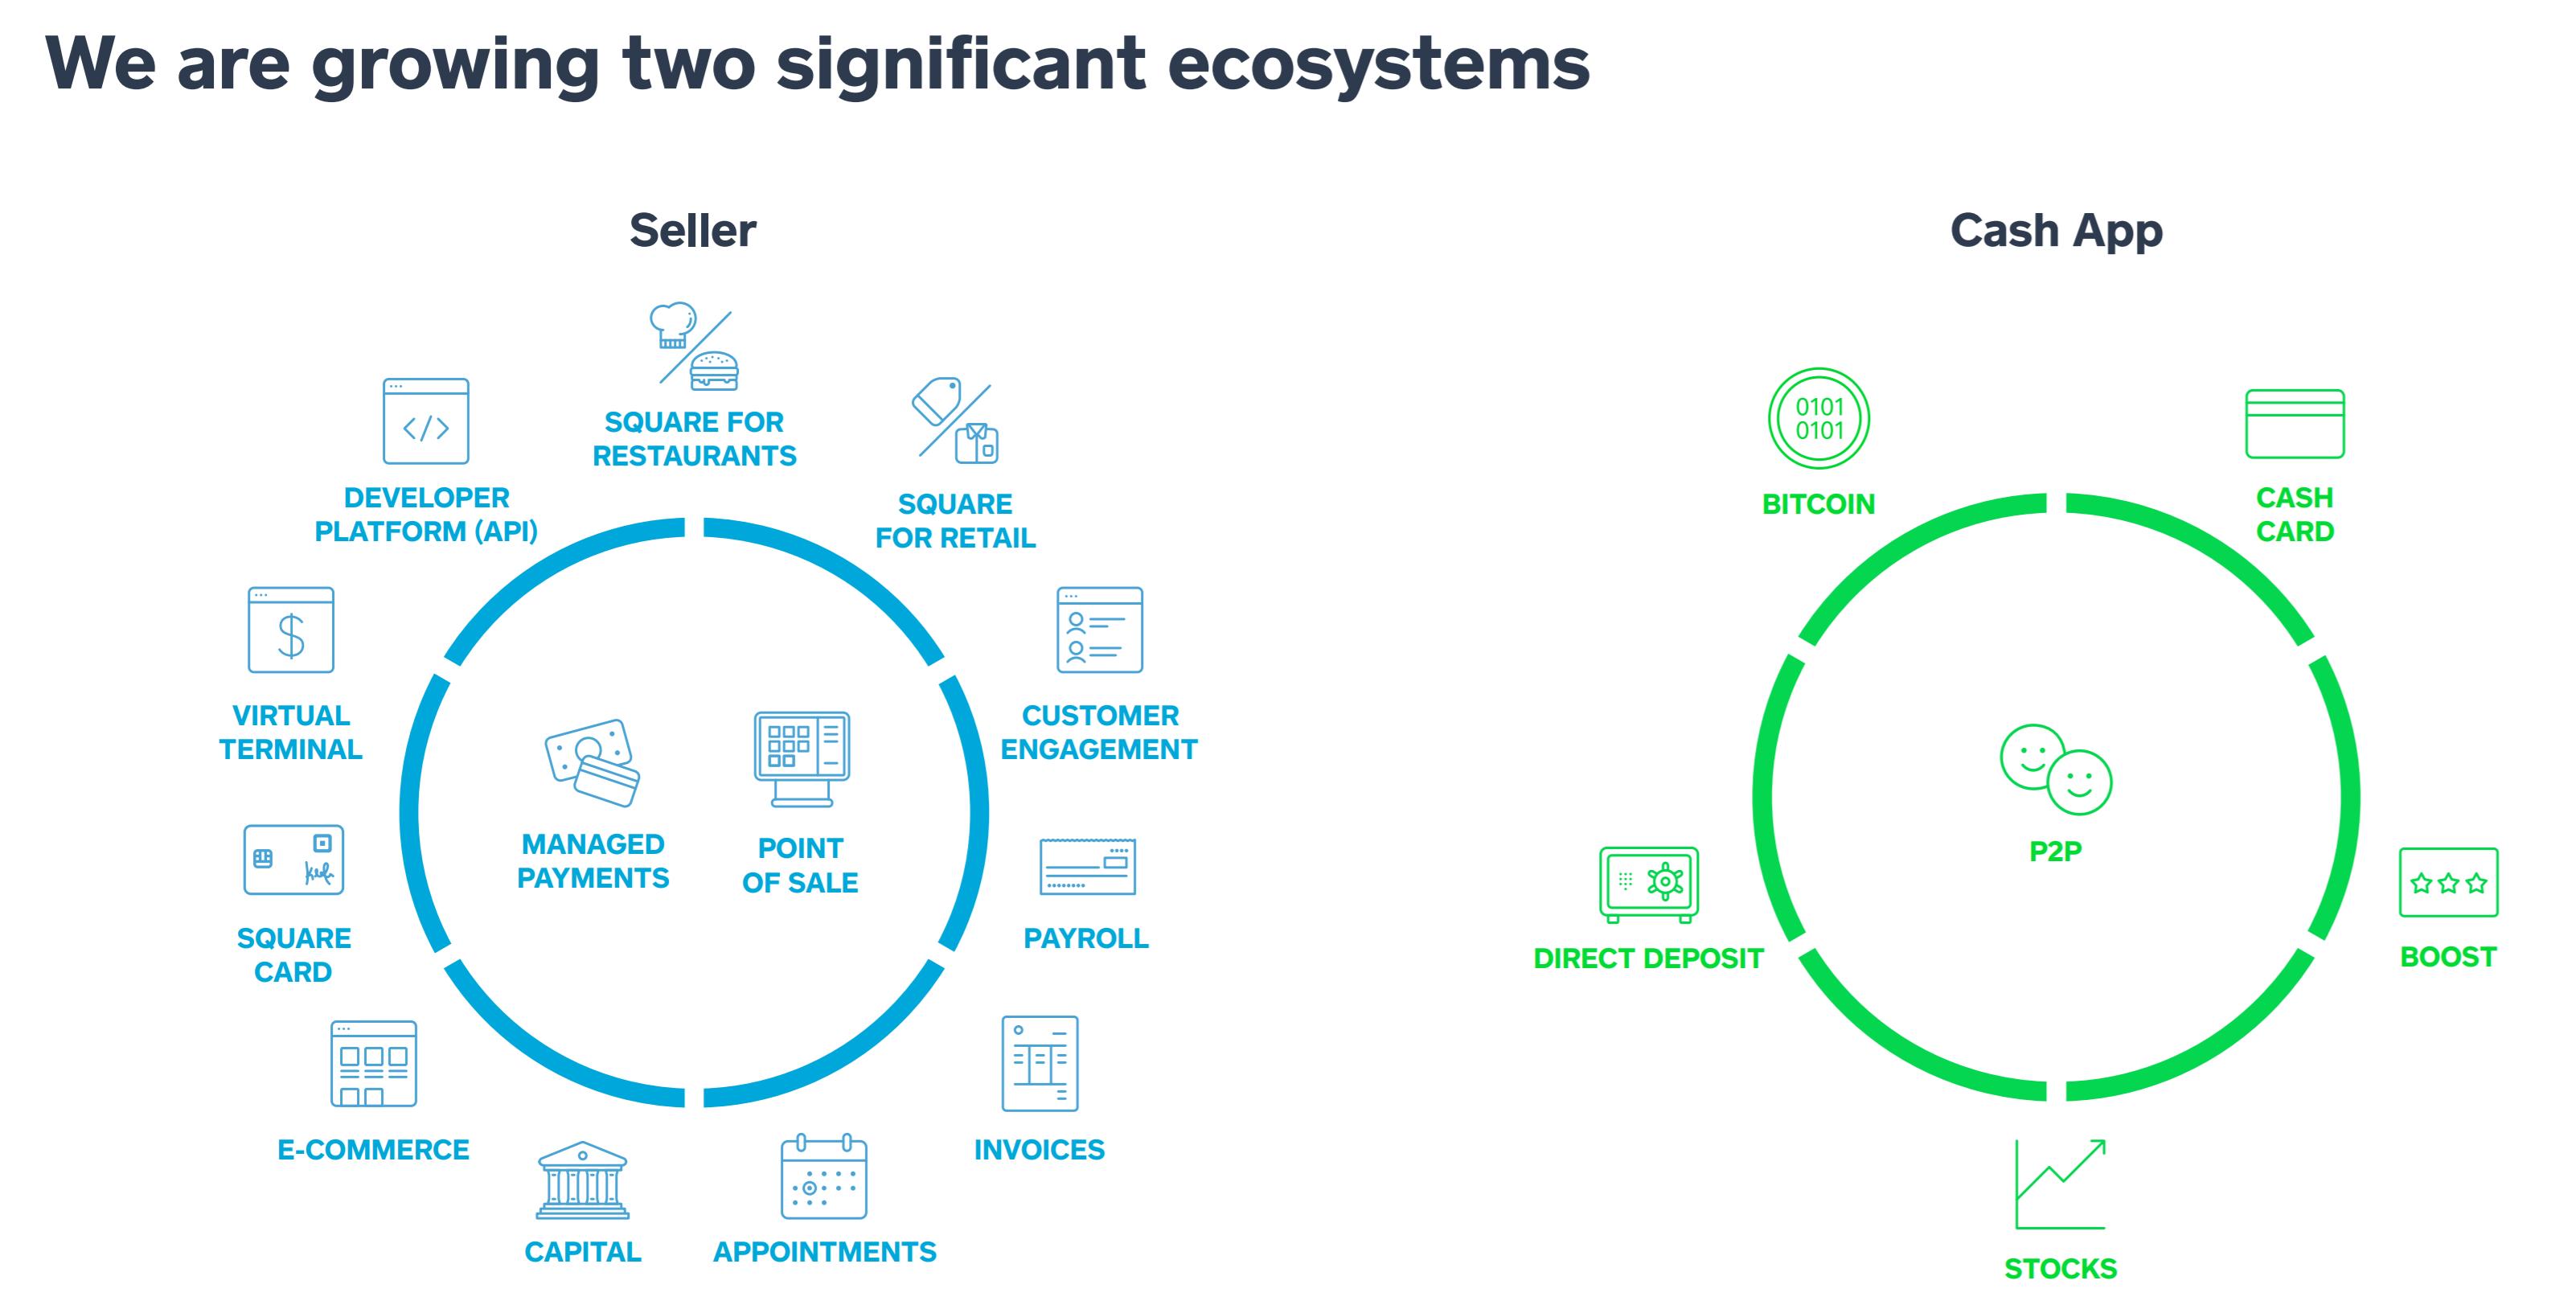 Square เผยมีผู้ใช้งาน Cash App เพิ่มมากขึ้น ช่วงตลาดผันผวนและวิกฤติโคโรนาไวรัส